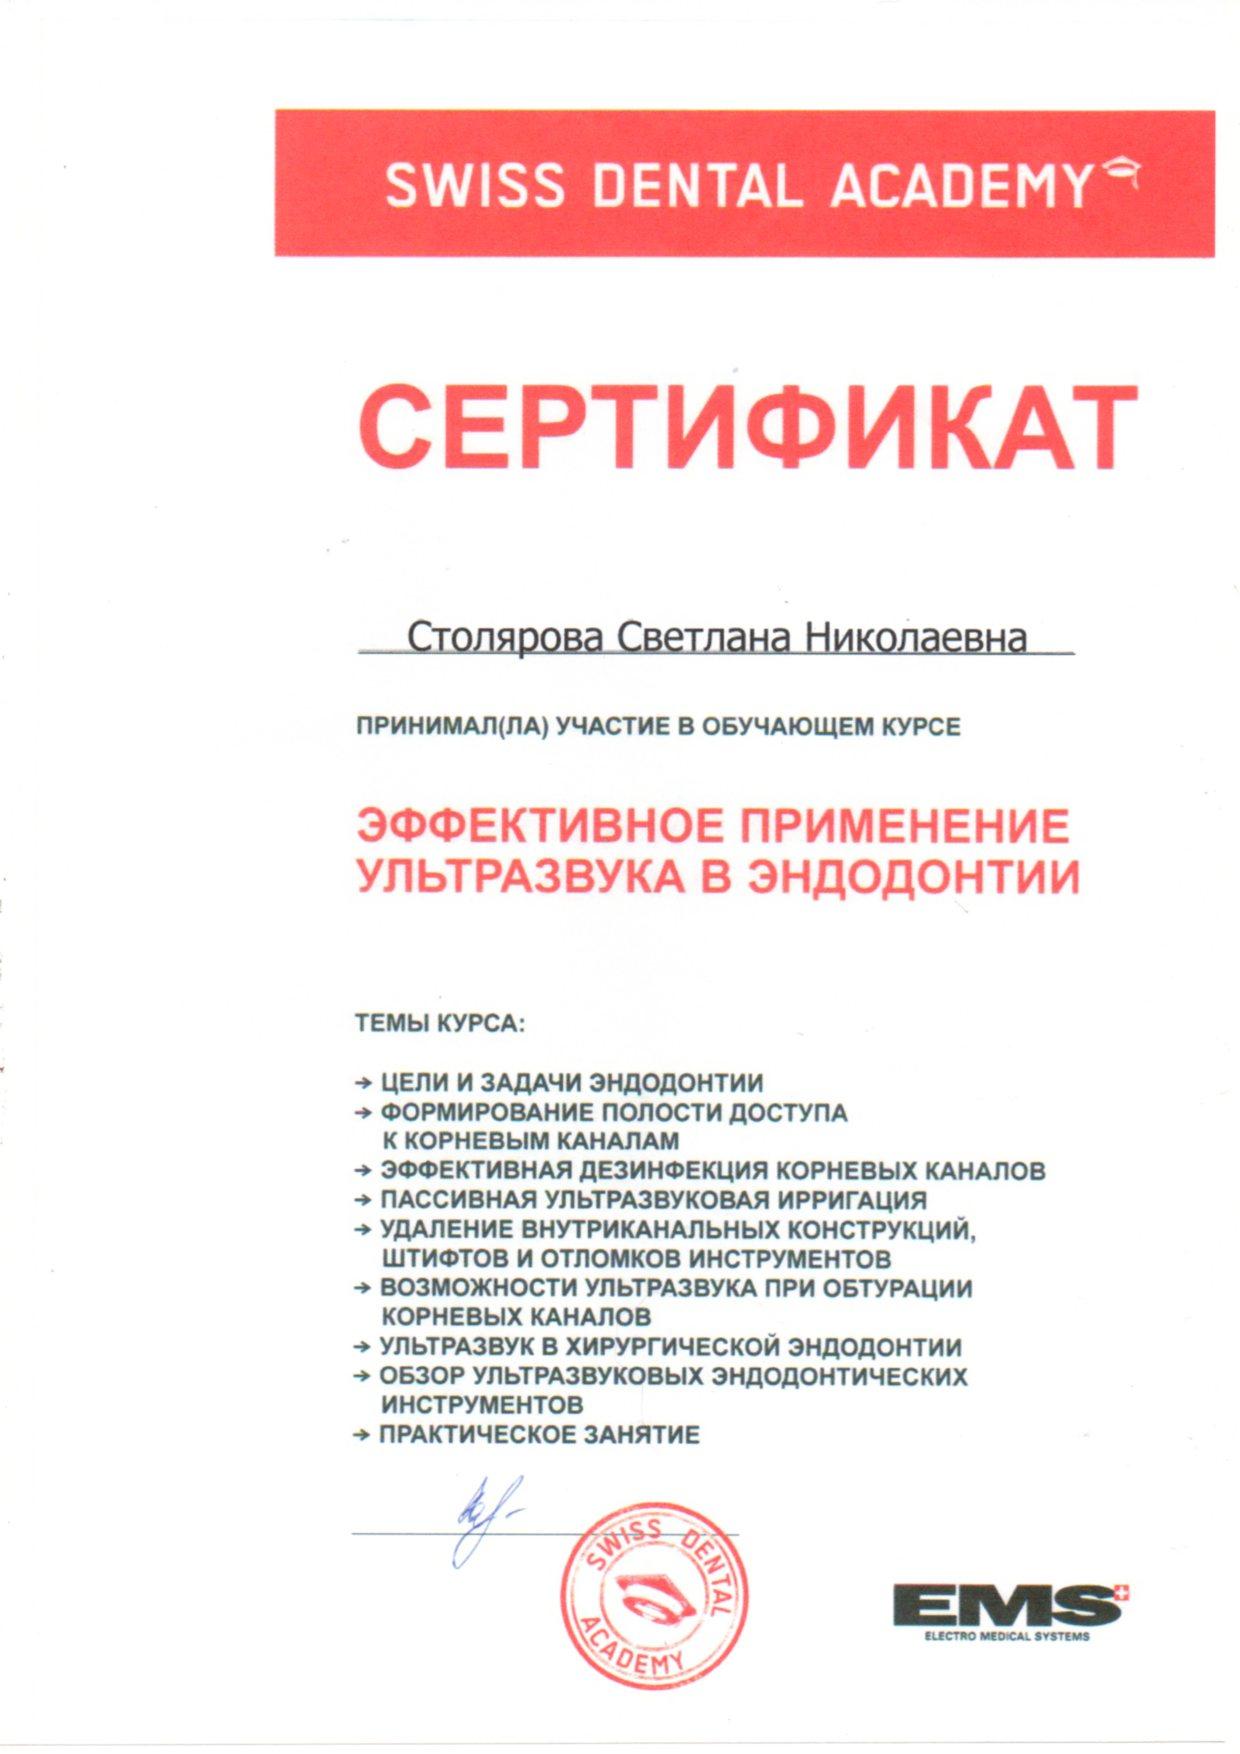 Столярова Светлана Николаевна - Сертификат_04